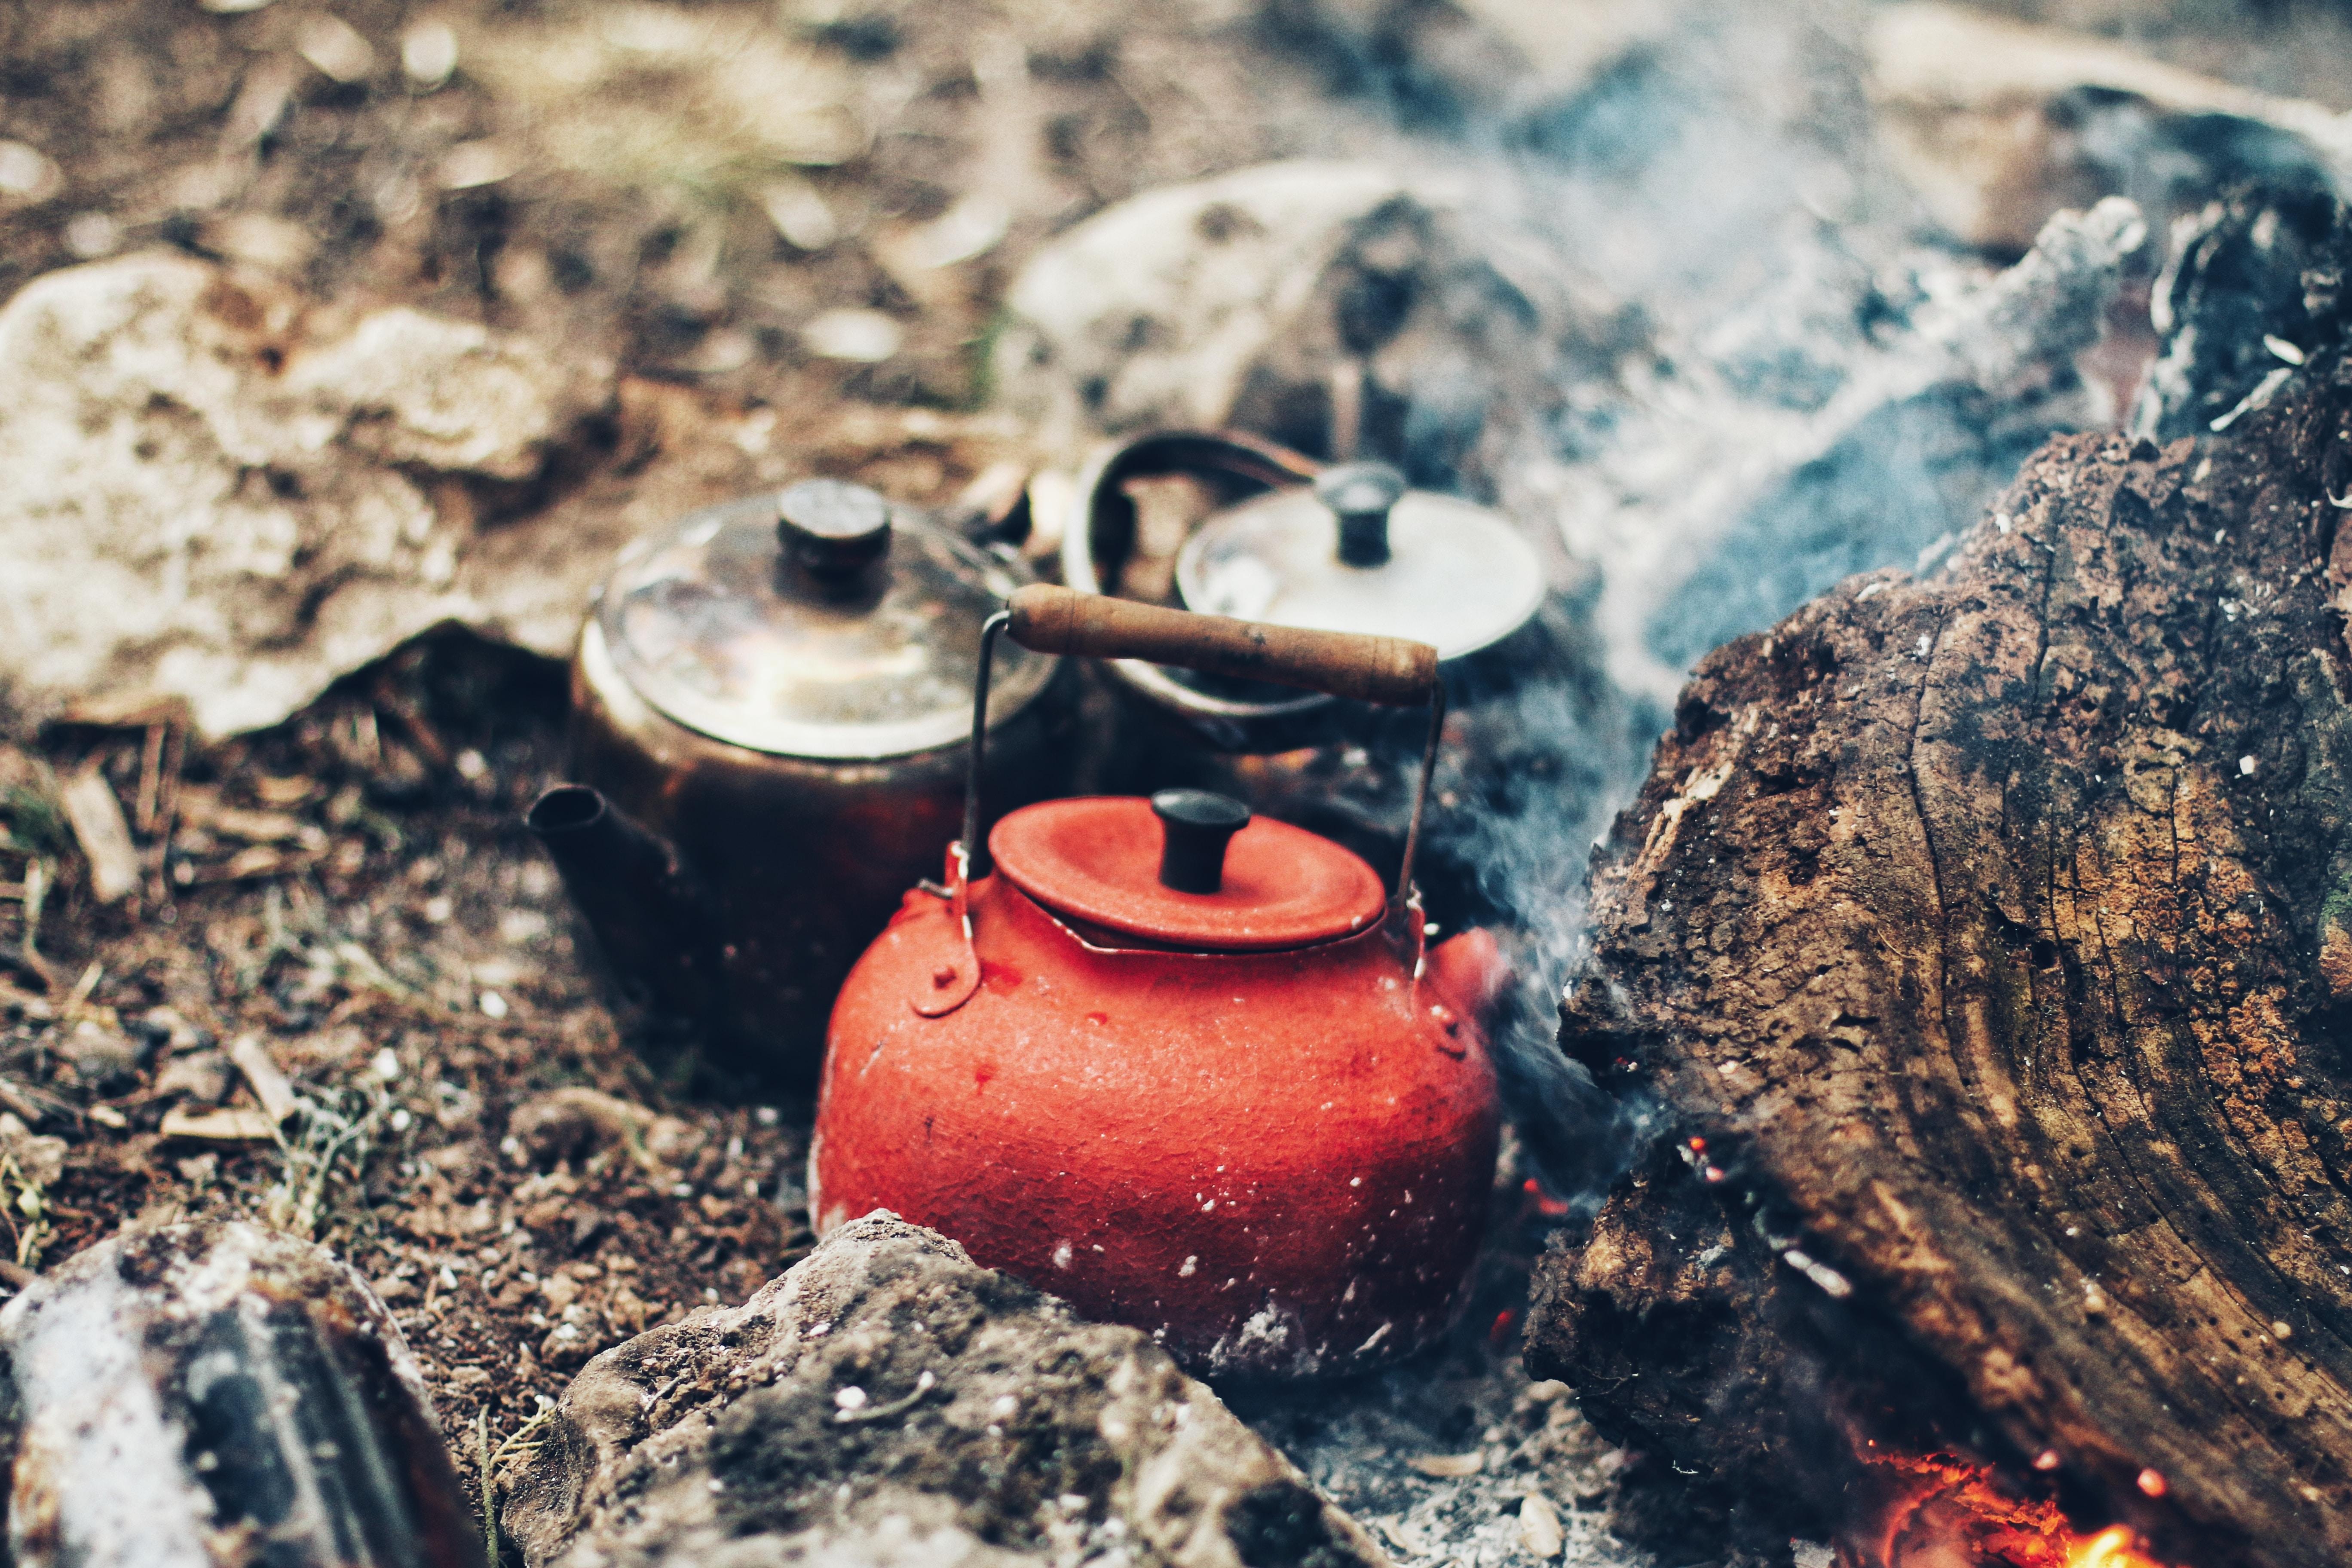 Vintage rustic teakettle head up near stack of firewood outside